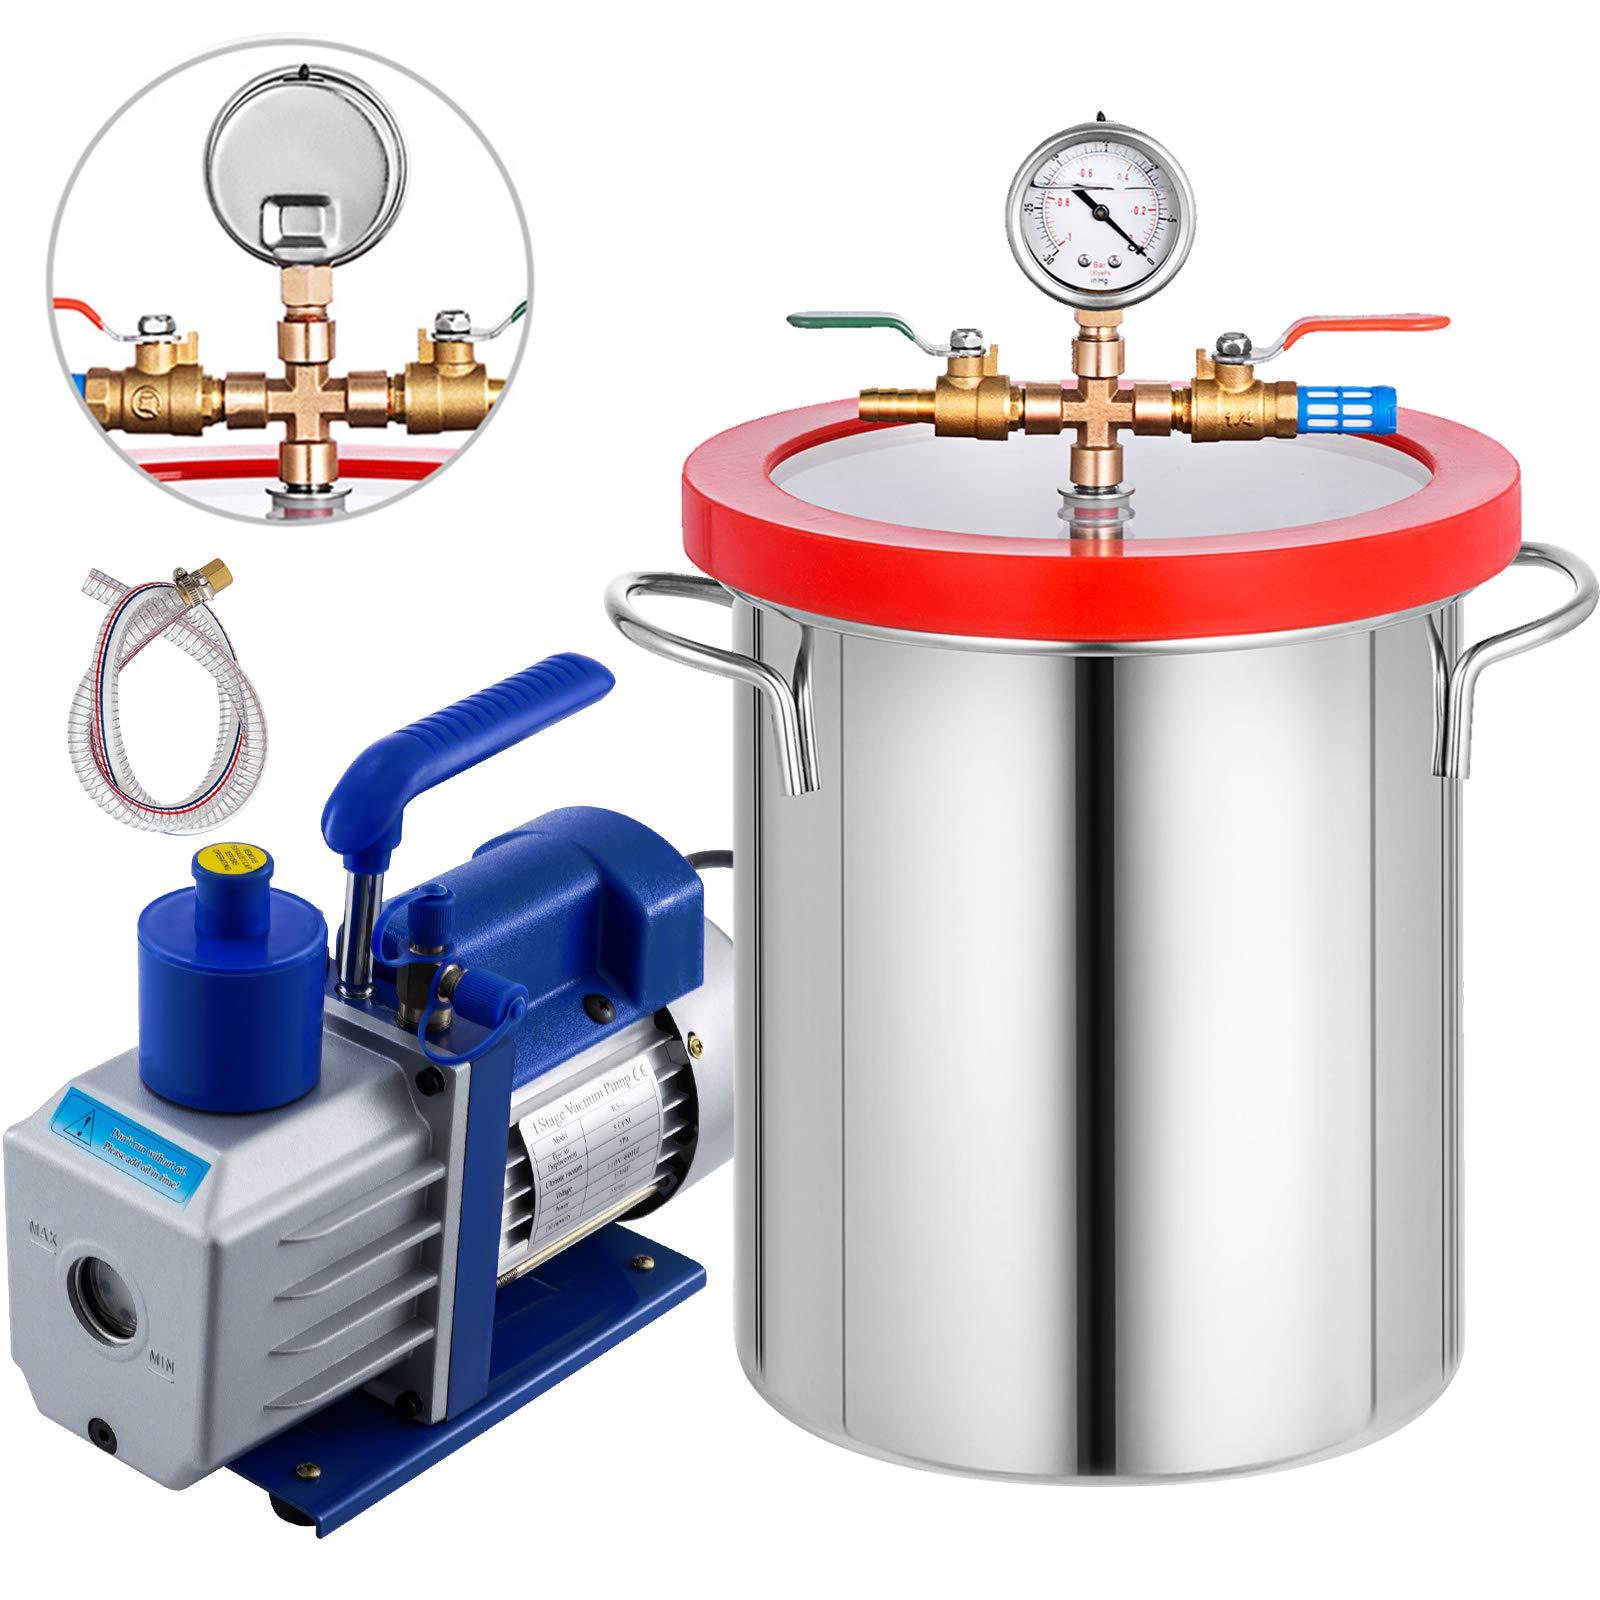 Bestauto 5 Gallon Vacuum Degassing Chamber Kit Stainless Steel Degassing Chamber Kit 18L Vacuum Chamber Kit with 5 CFM 1/2HP Single-Stage Vacuum Pump(5 CFM Vacuum Pump + 5 Gallon Vacuum Chamber) by Best In Auto